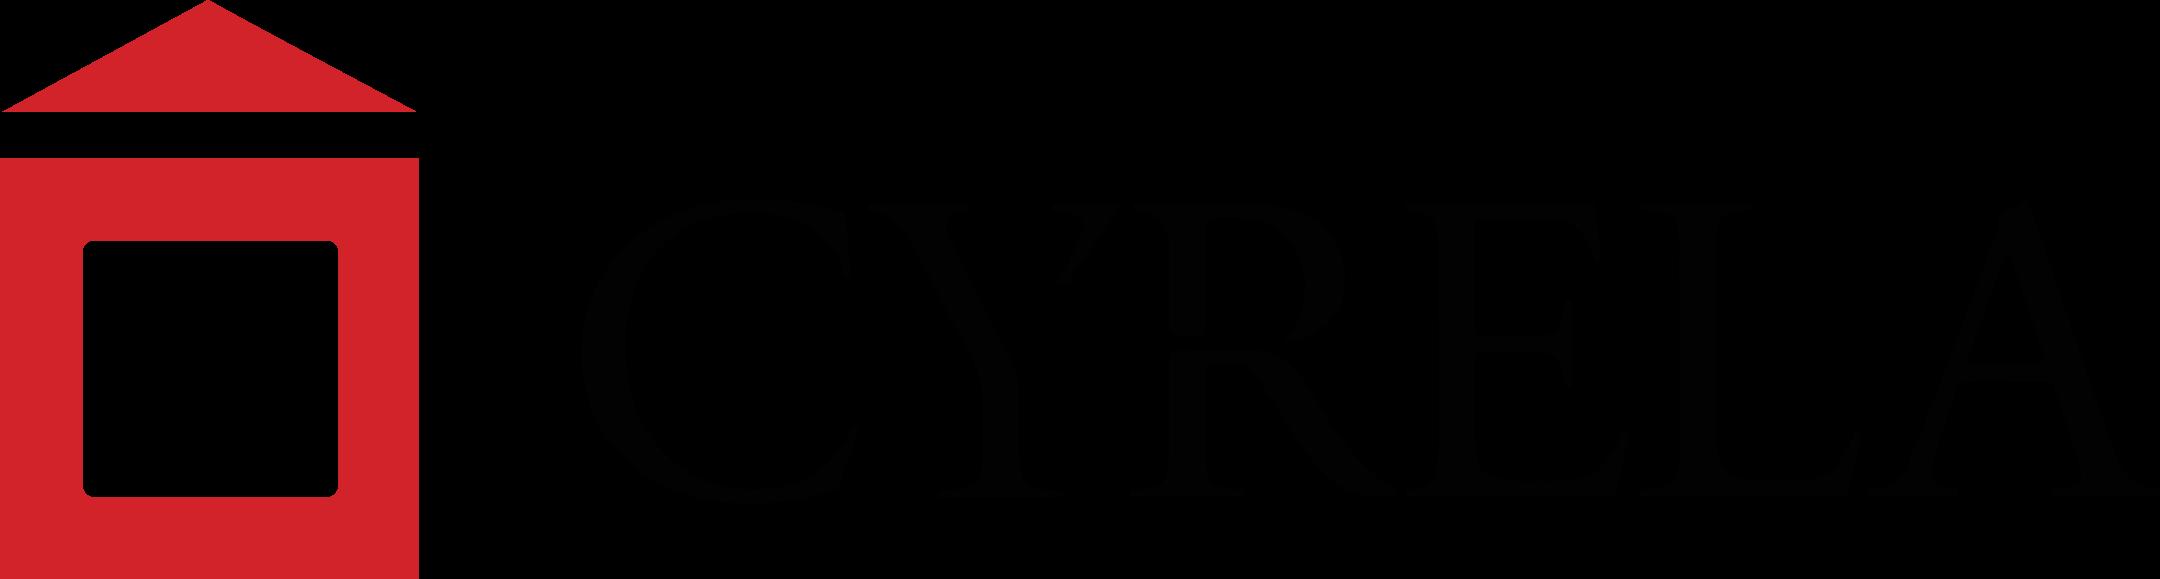 cyrela logo 1 - Cyrela Logo